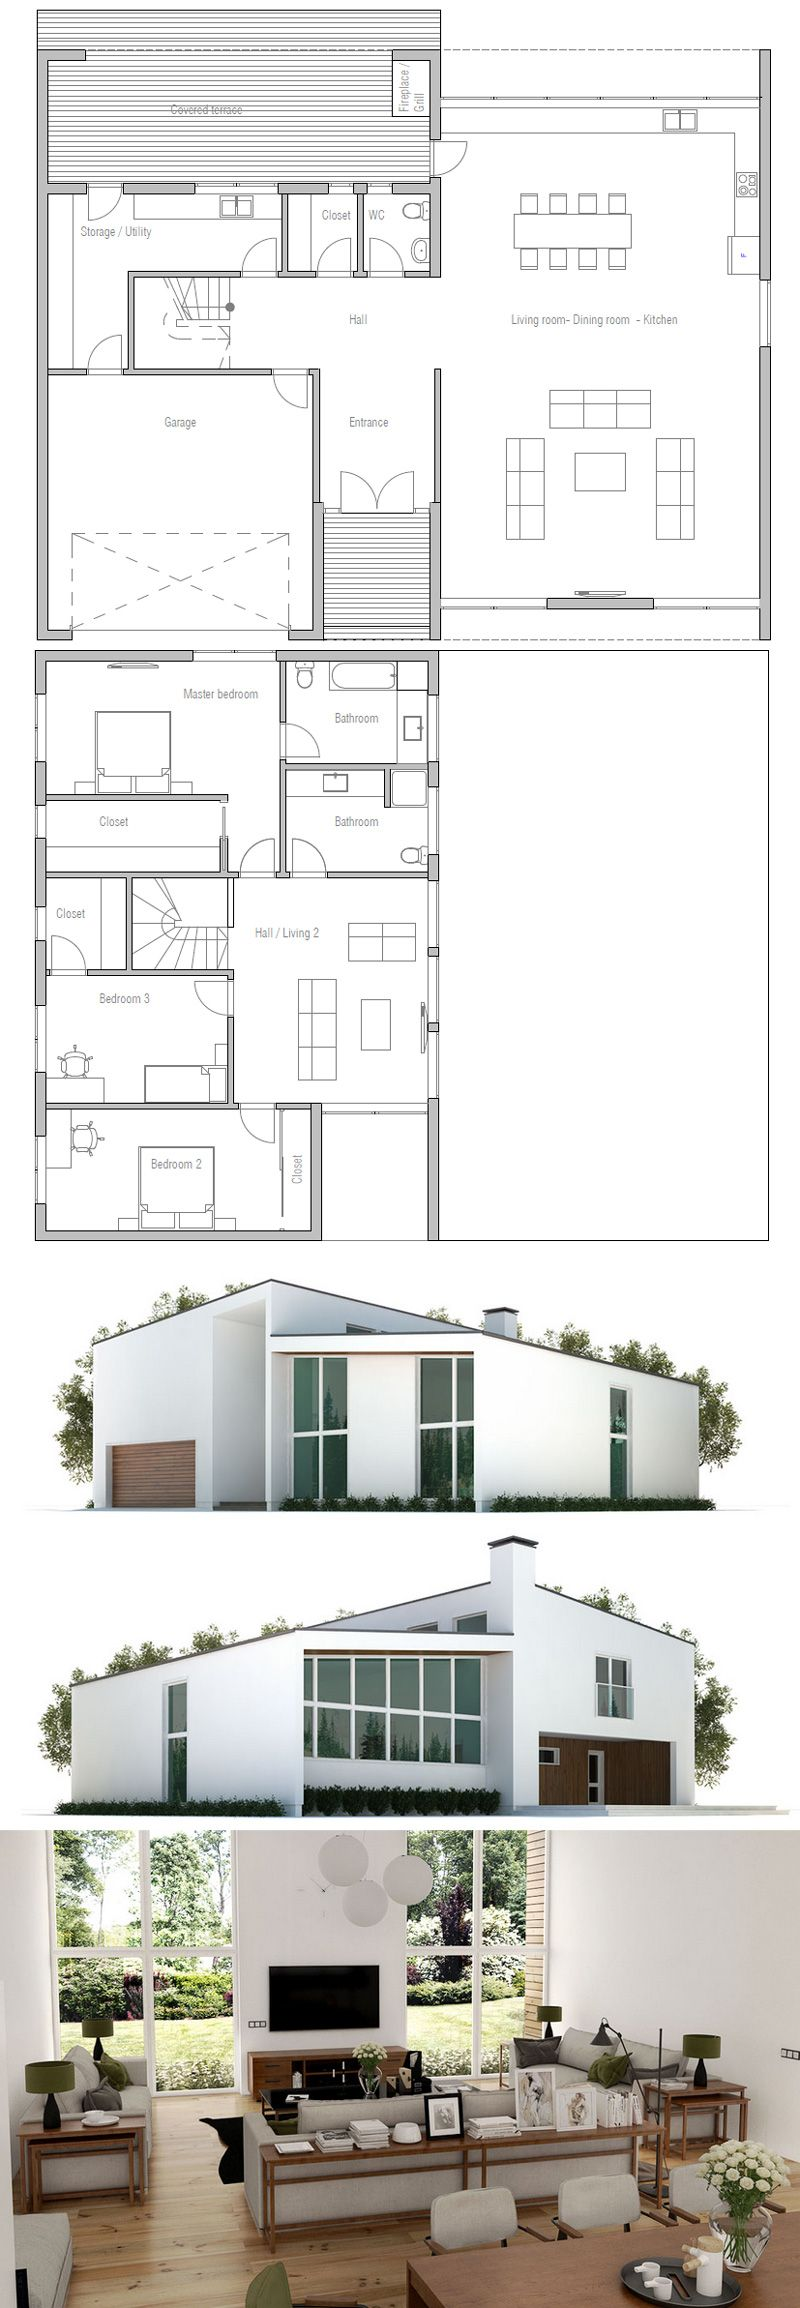 bien zenker jahresabschluss 1000+ images about Dreamhouse   Haus, wilight and House